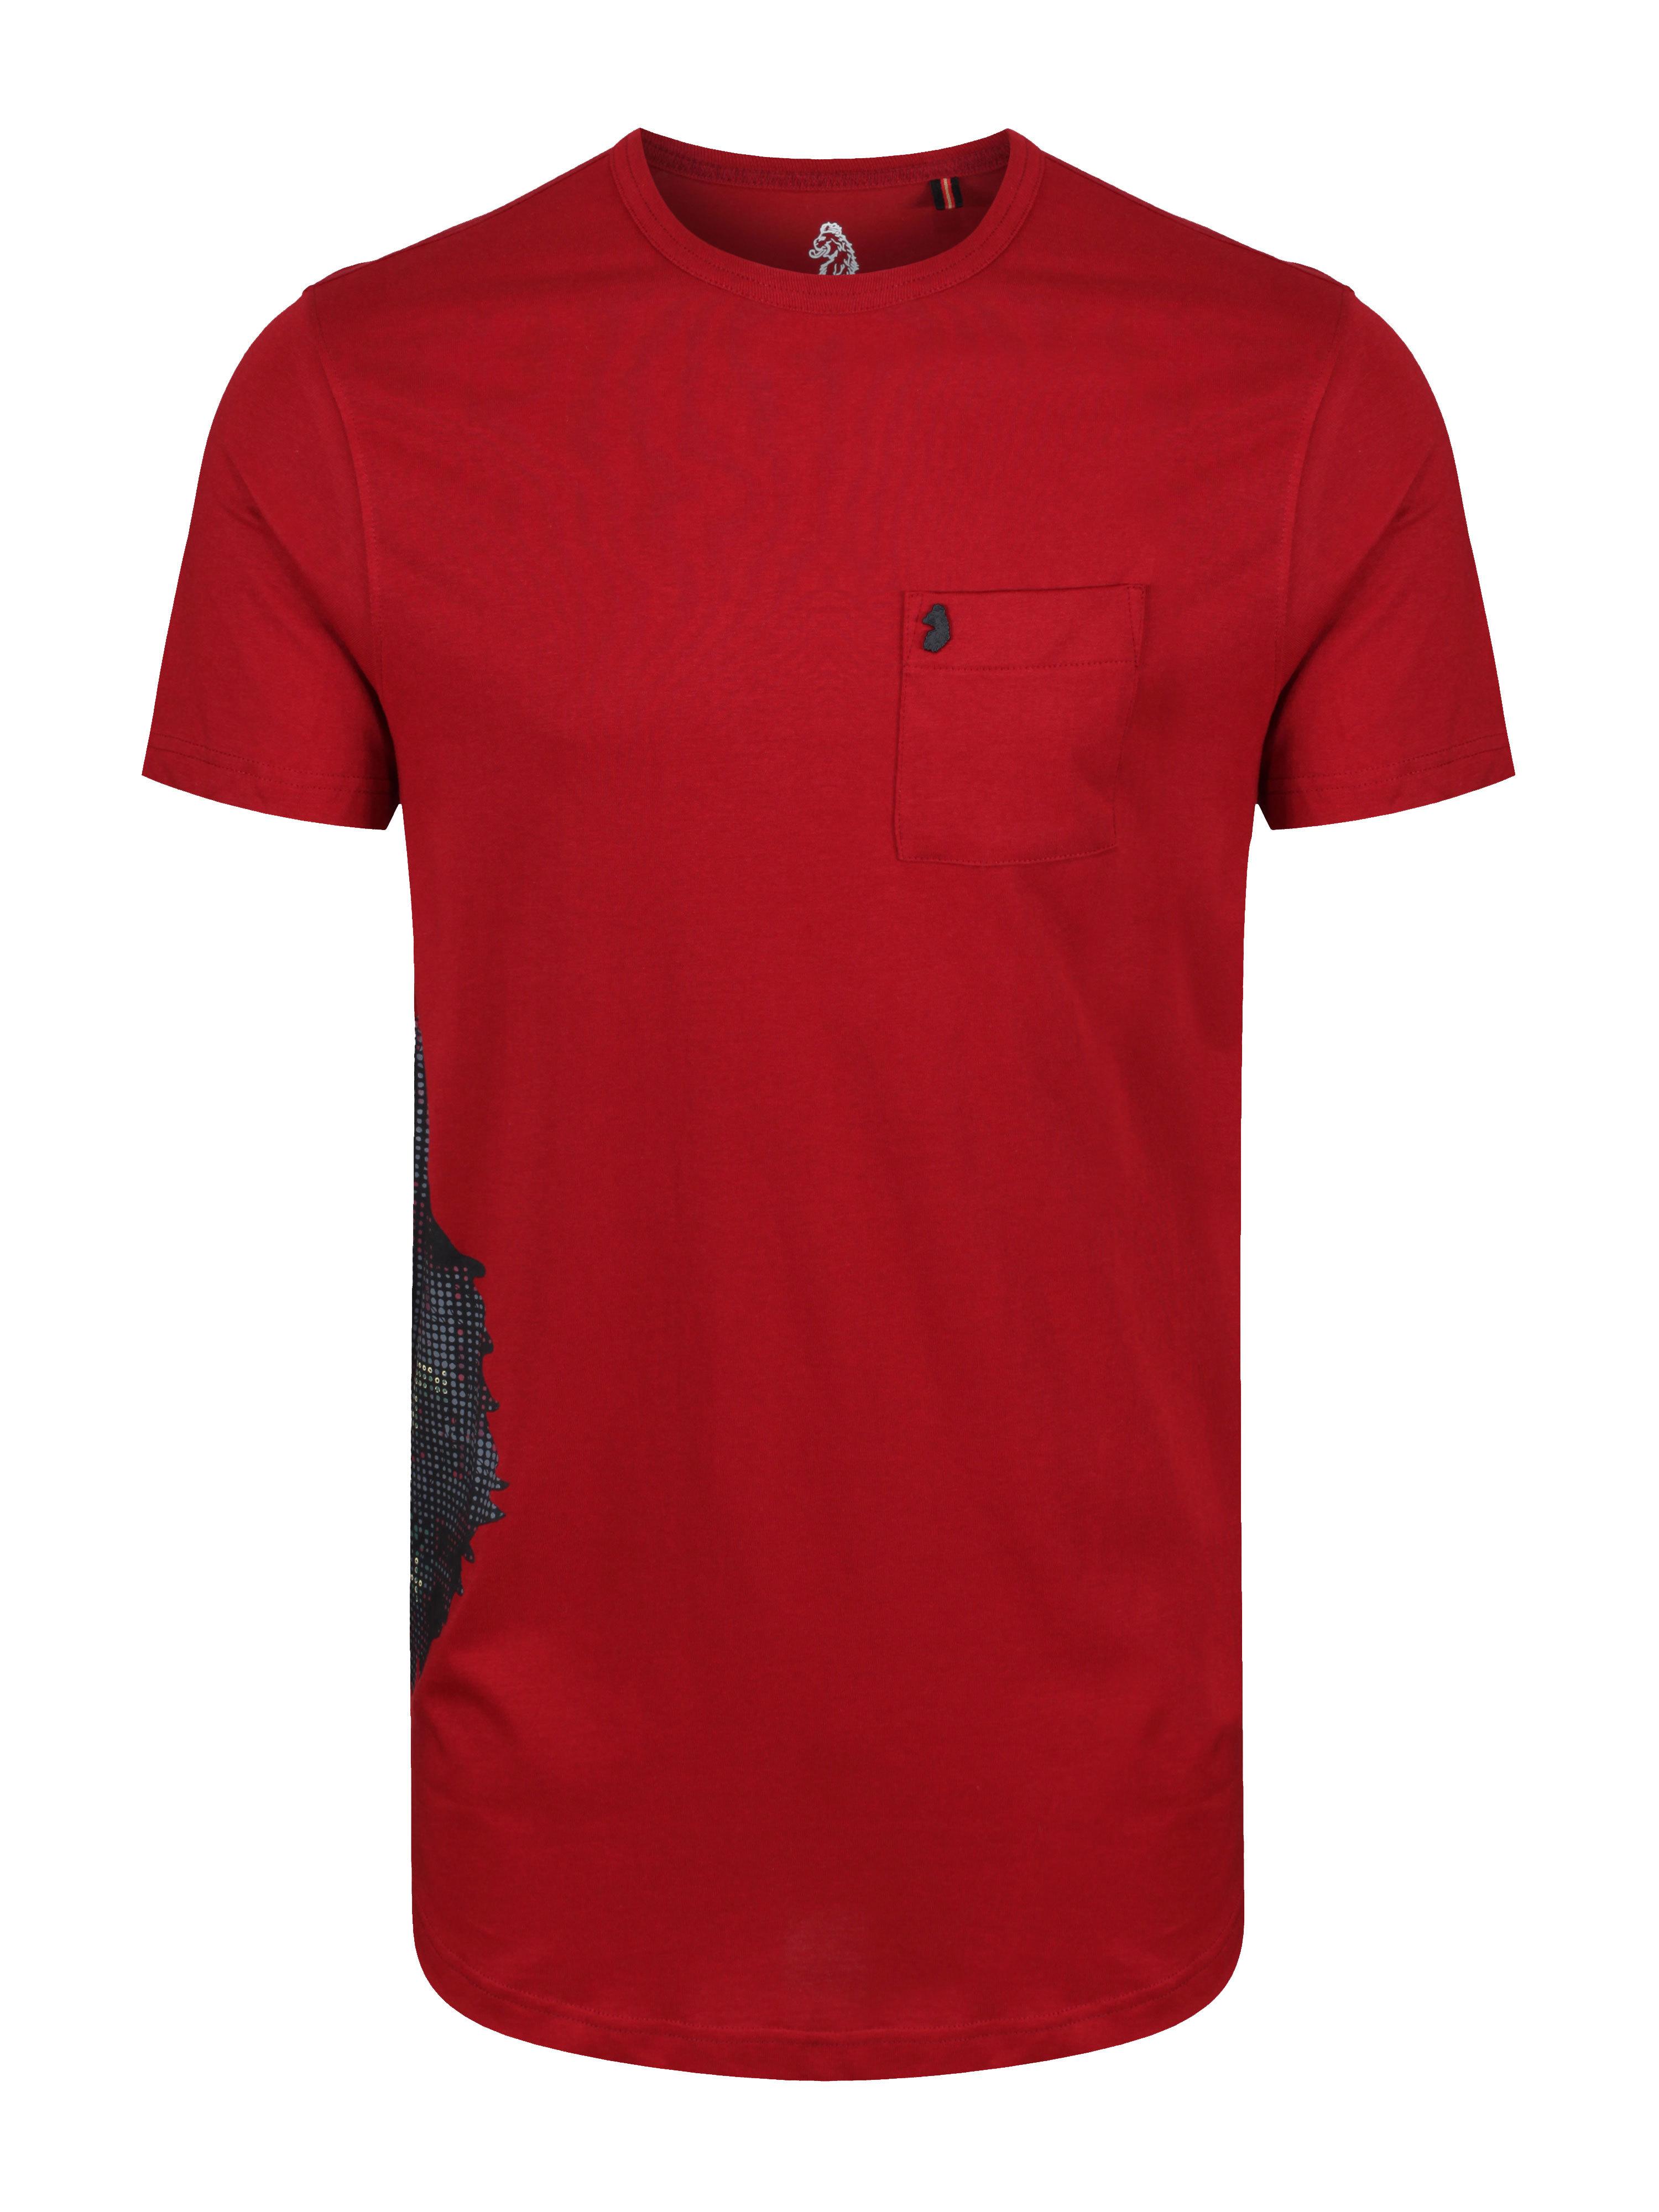 LUKE 1977 Positive Lion Side Seam Printed T-Shirt